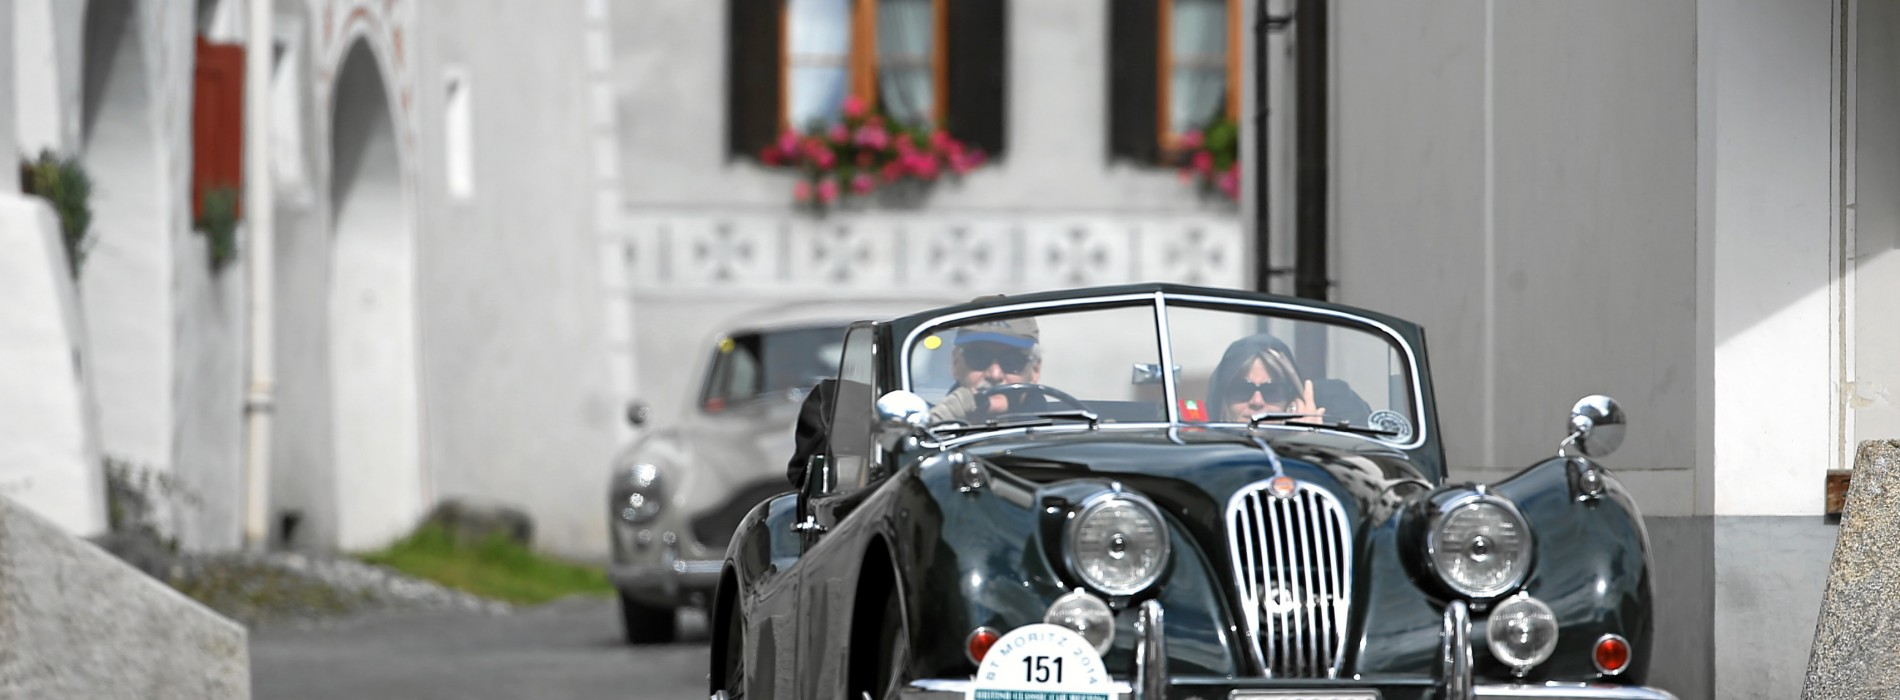 25th British Calssic Car Meeting in St. Moritz